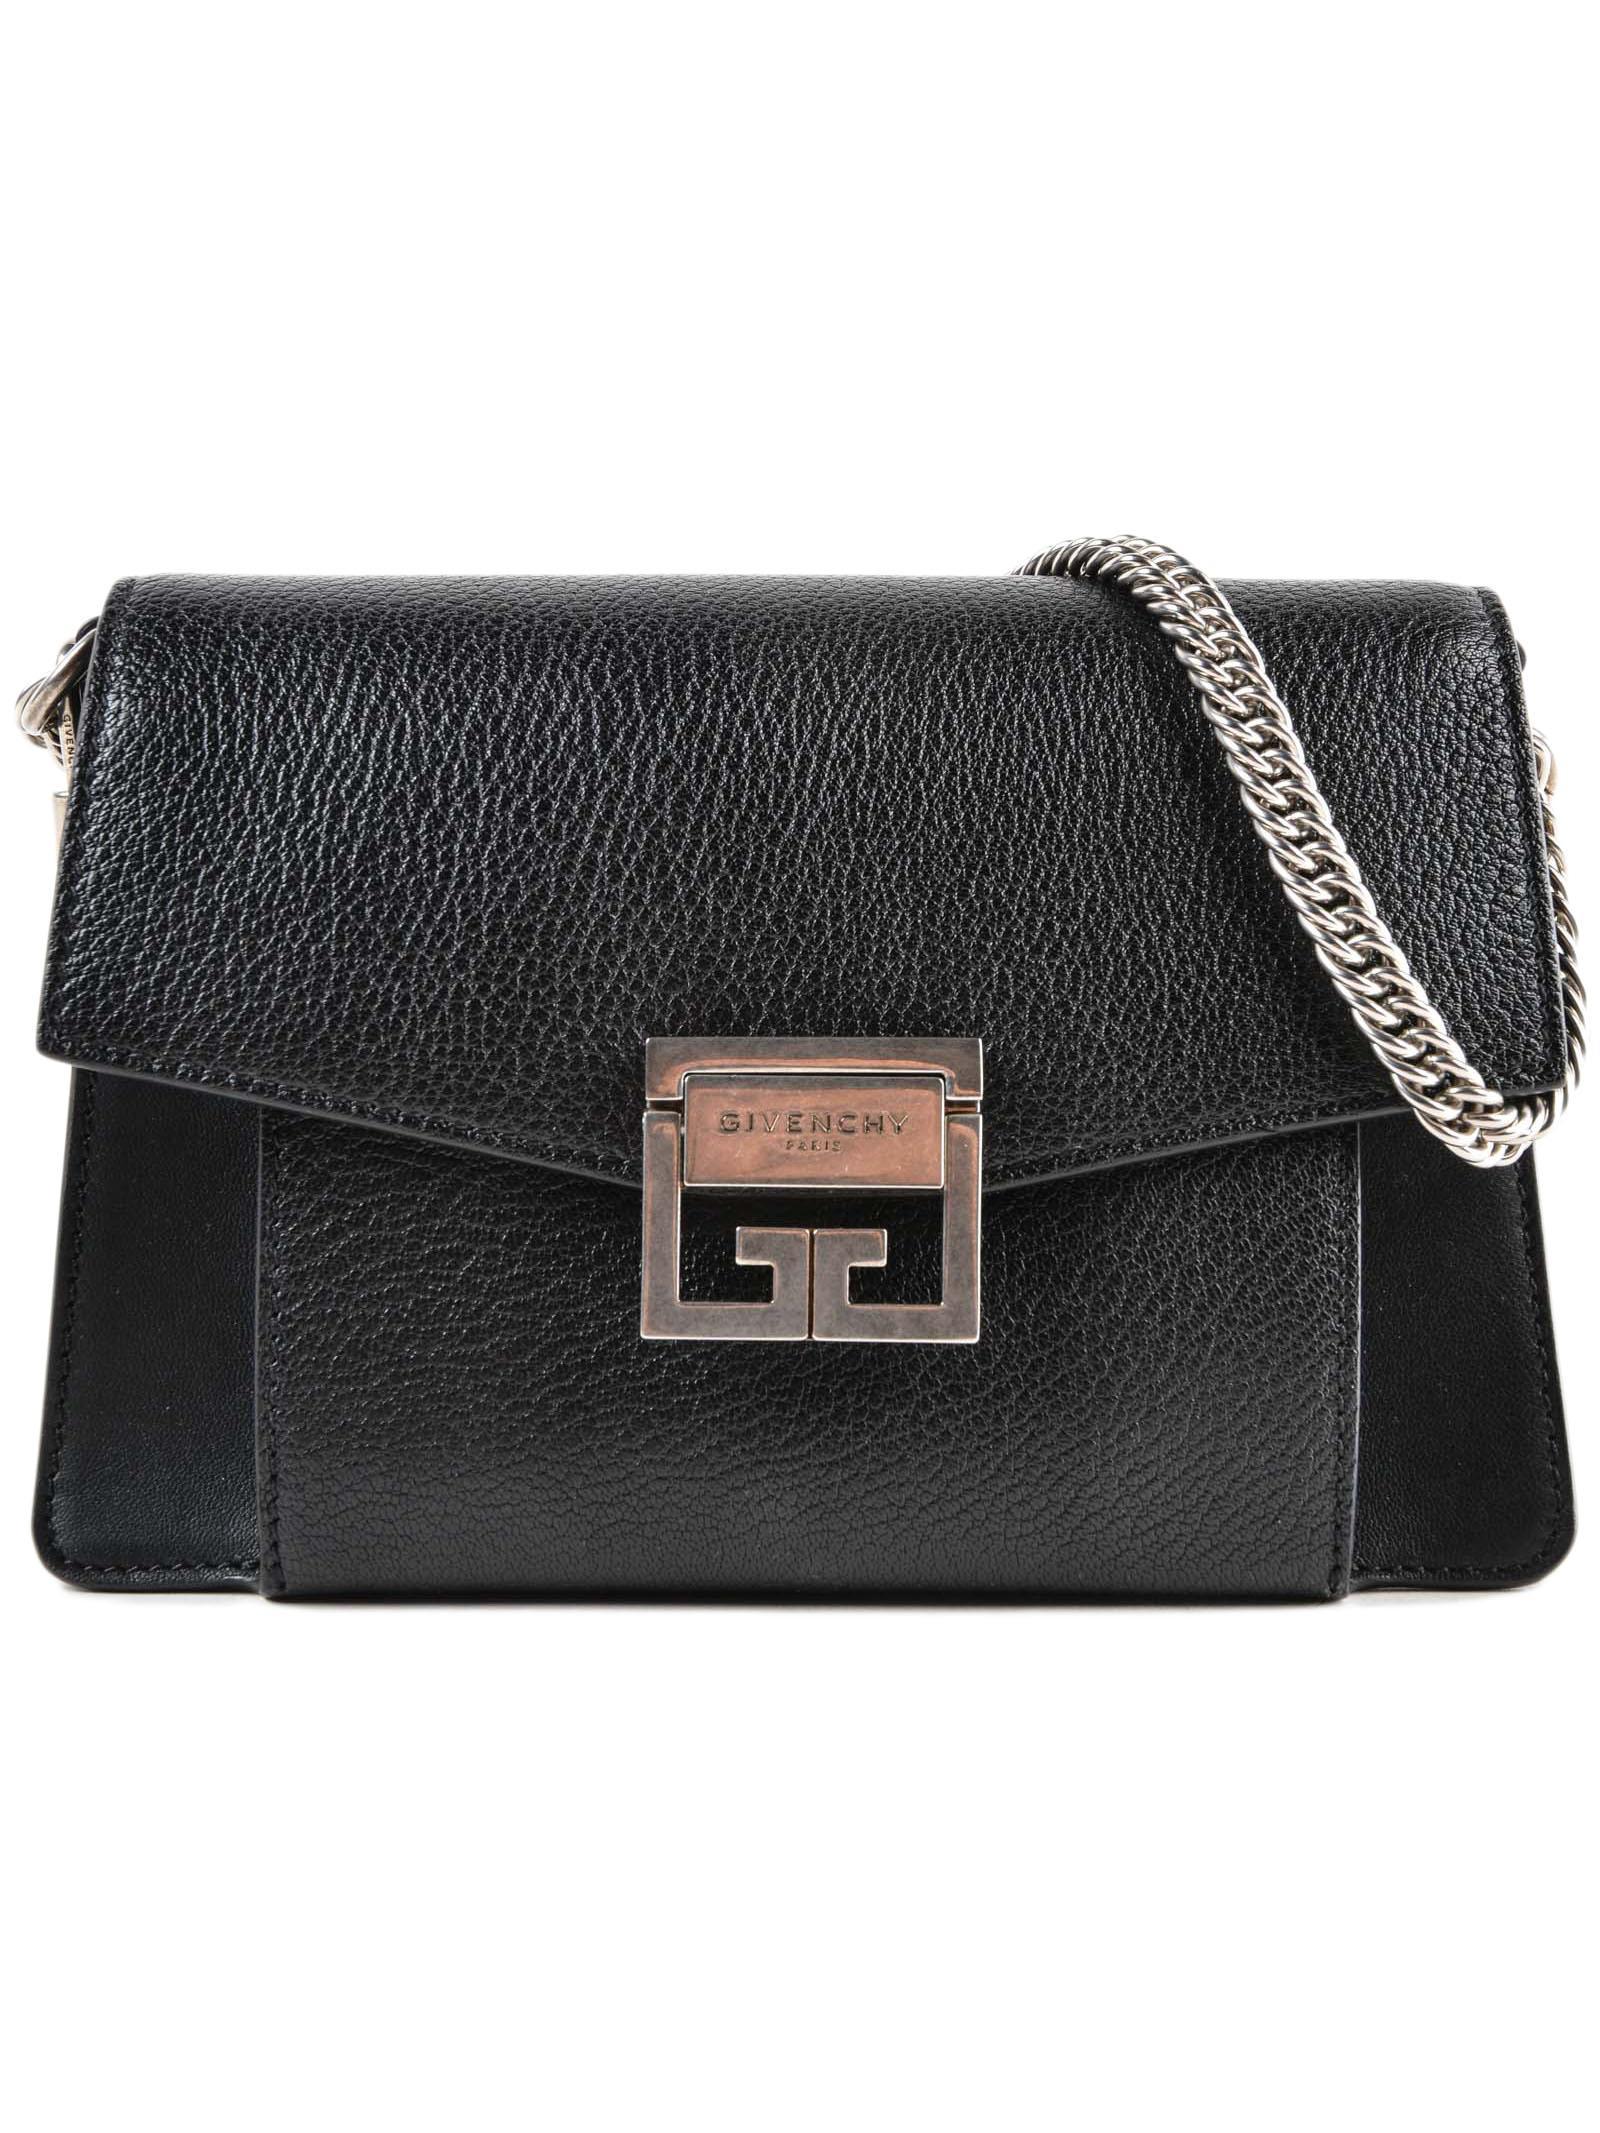 6d2d3221ecba Givenchy - Black Gv3 - Small Bag - Lyst. View fullscreen